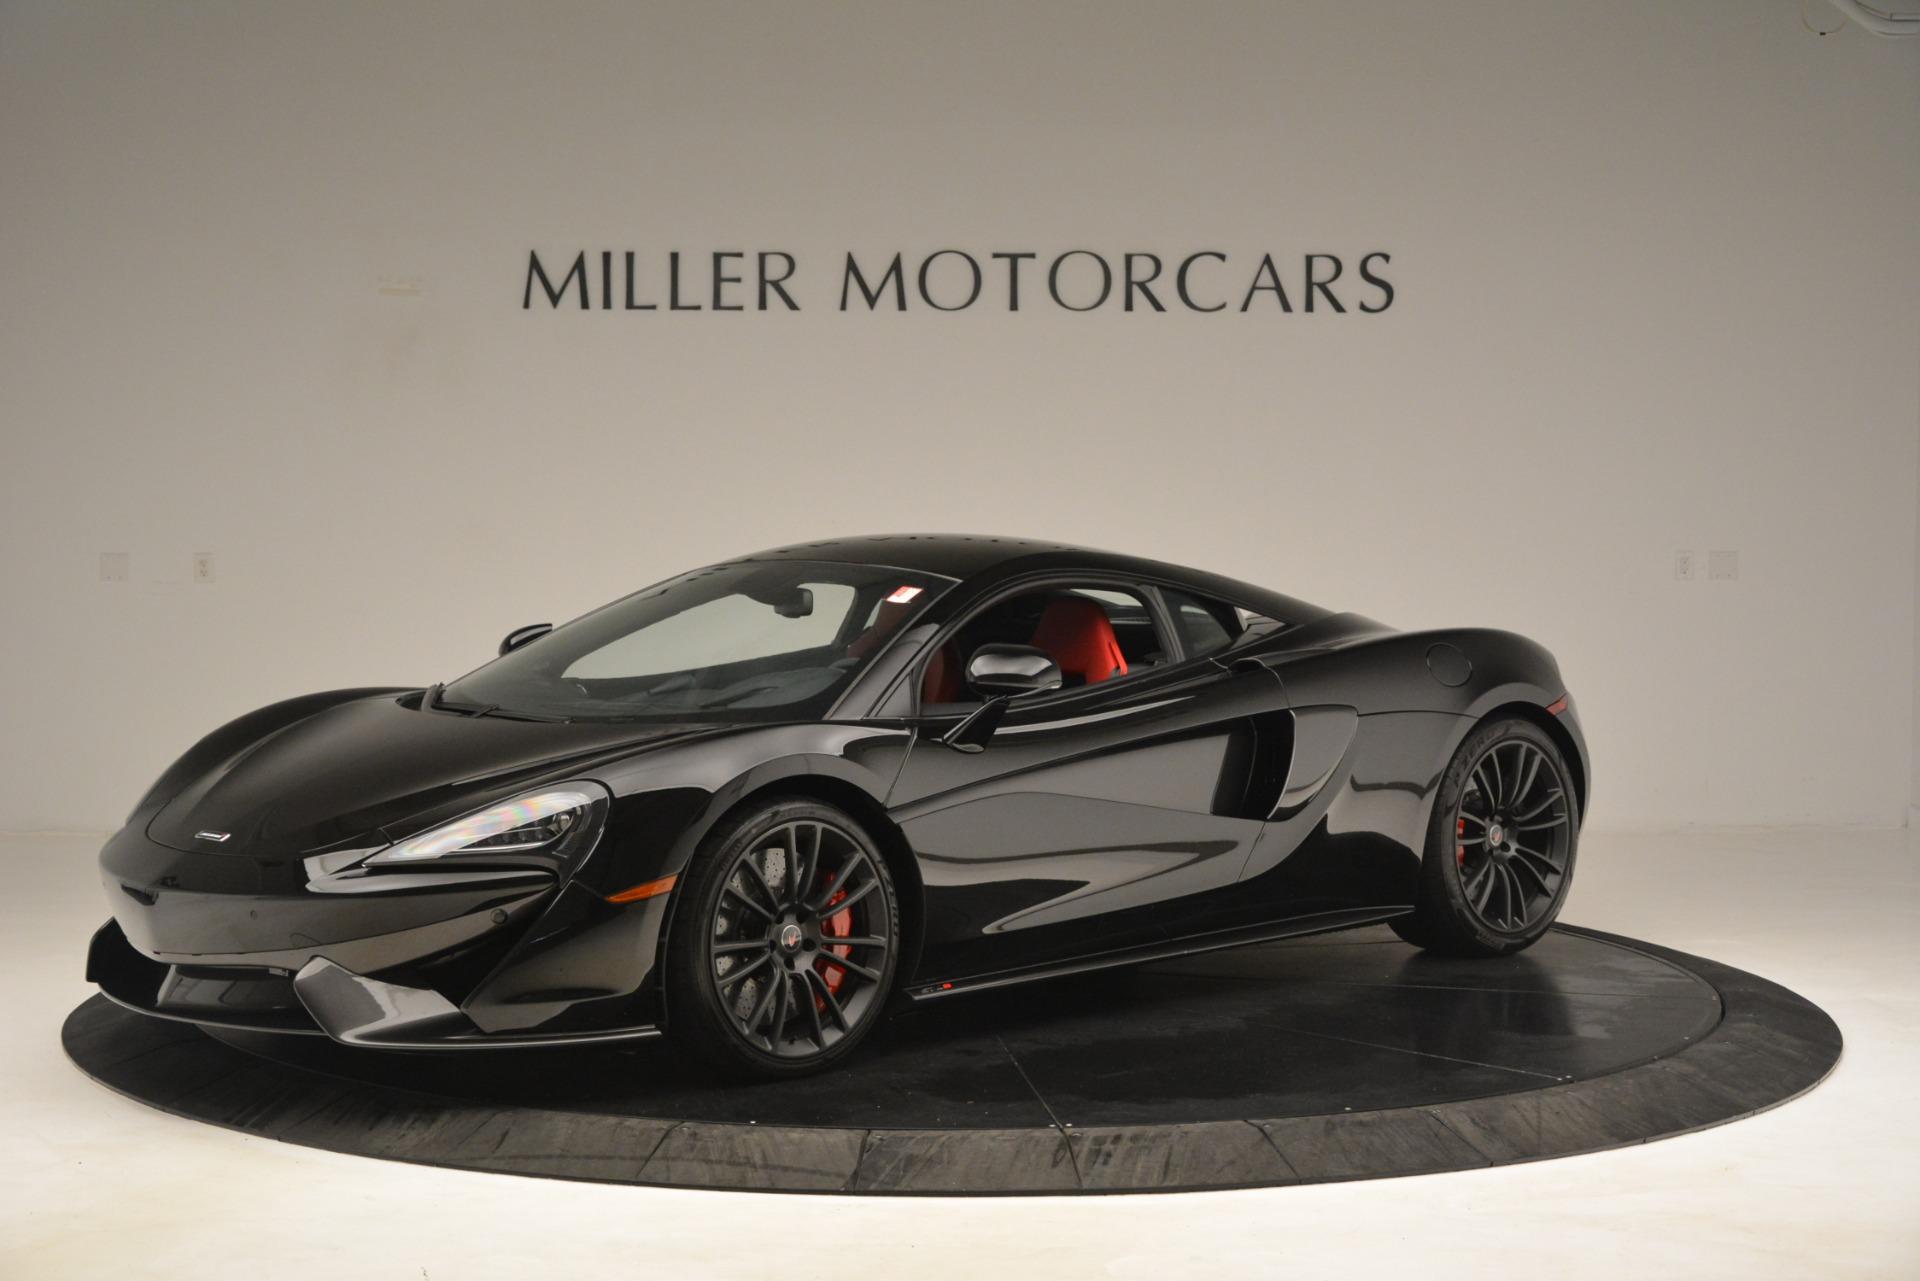 Used 2016 McLaren 570S Coupe for sale Sold at Alfa Romeo of Westport in Westport CT 06880 1